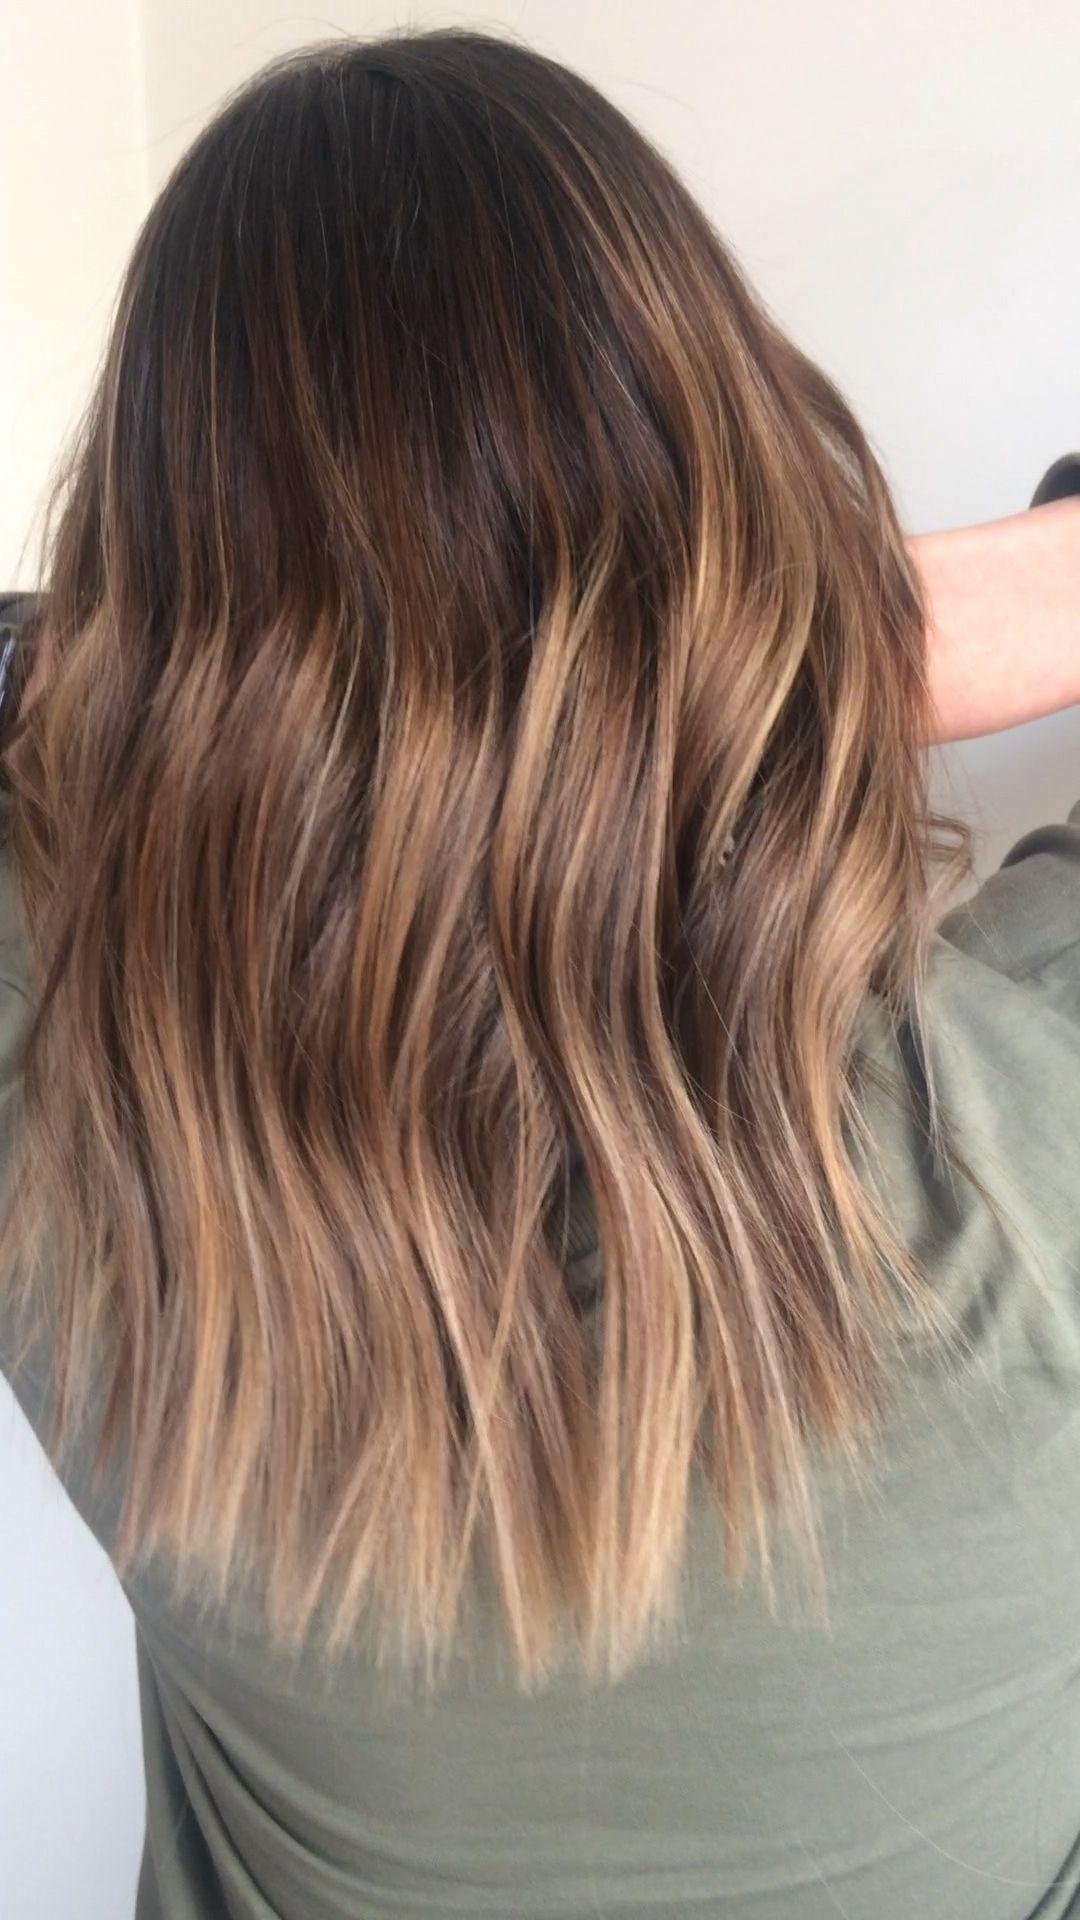 Brown Hair Colors For Fair Skin In 2021 Brown Hair Balayage Hair Color Hair Highlights